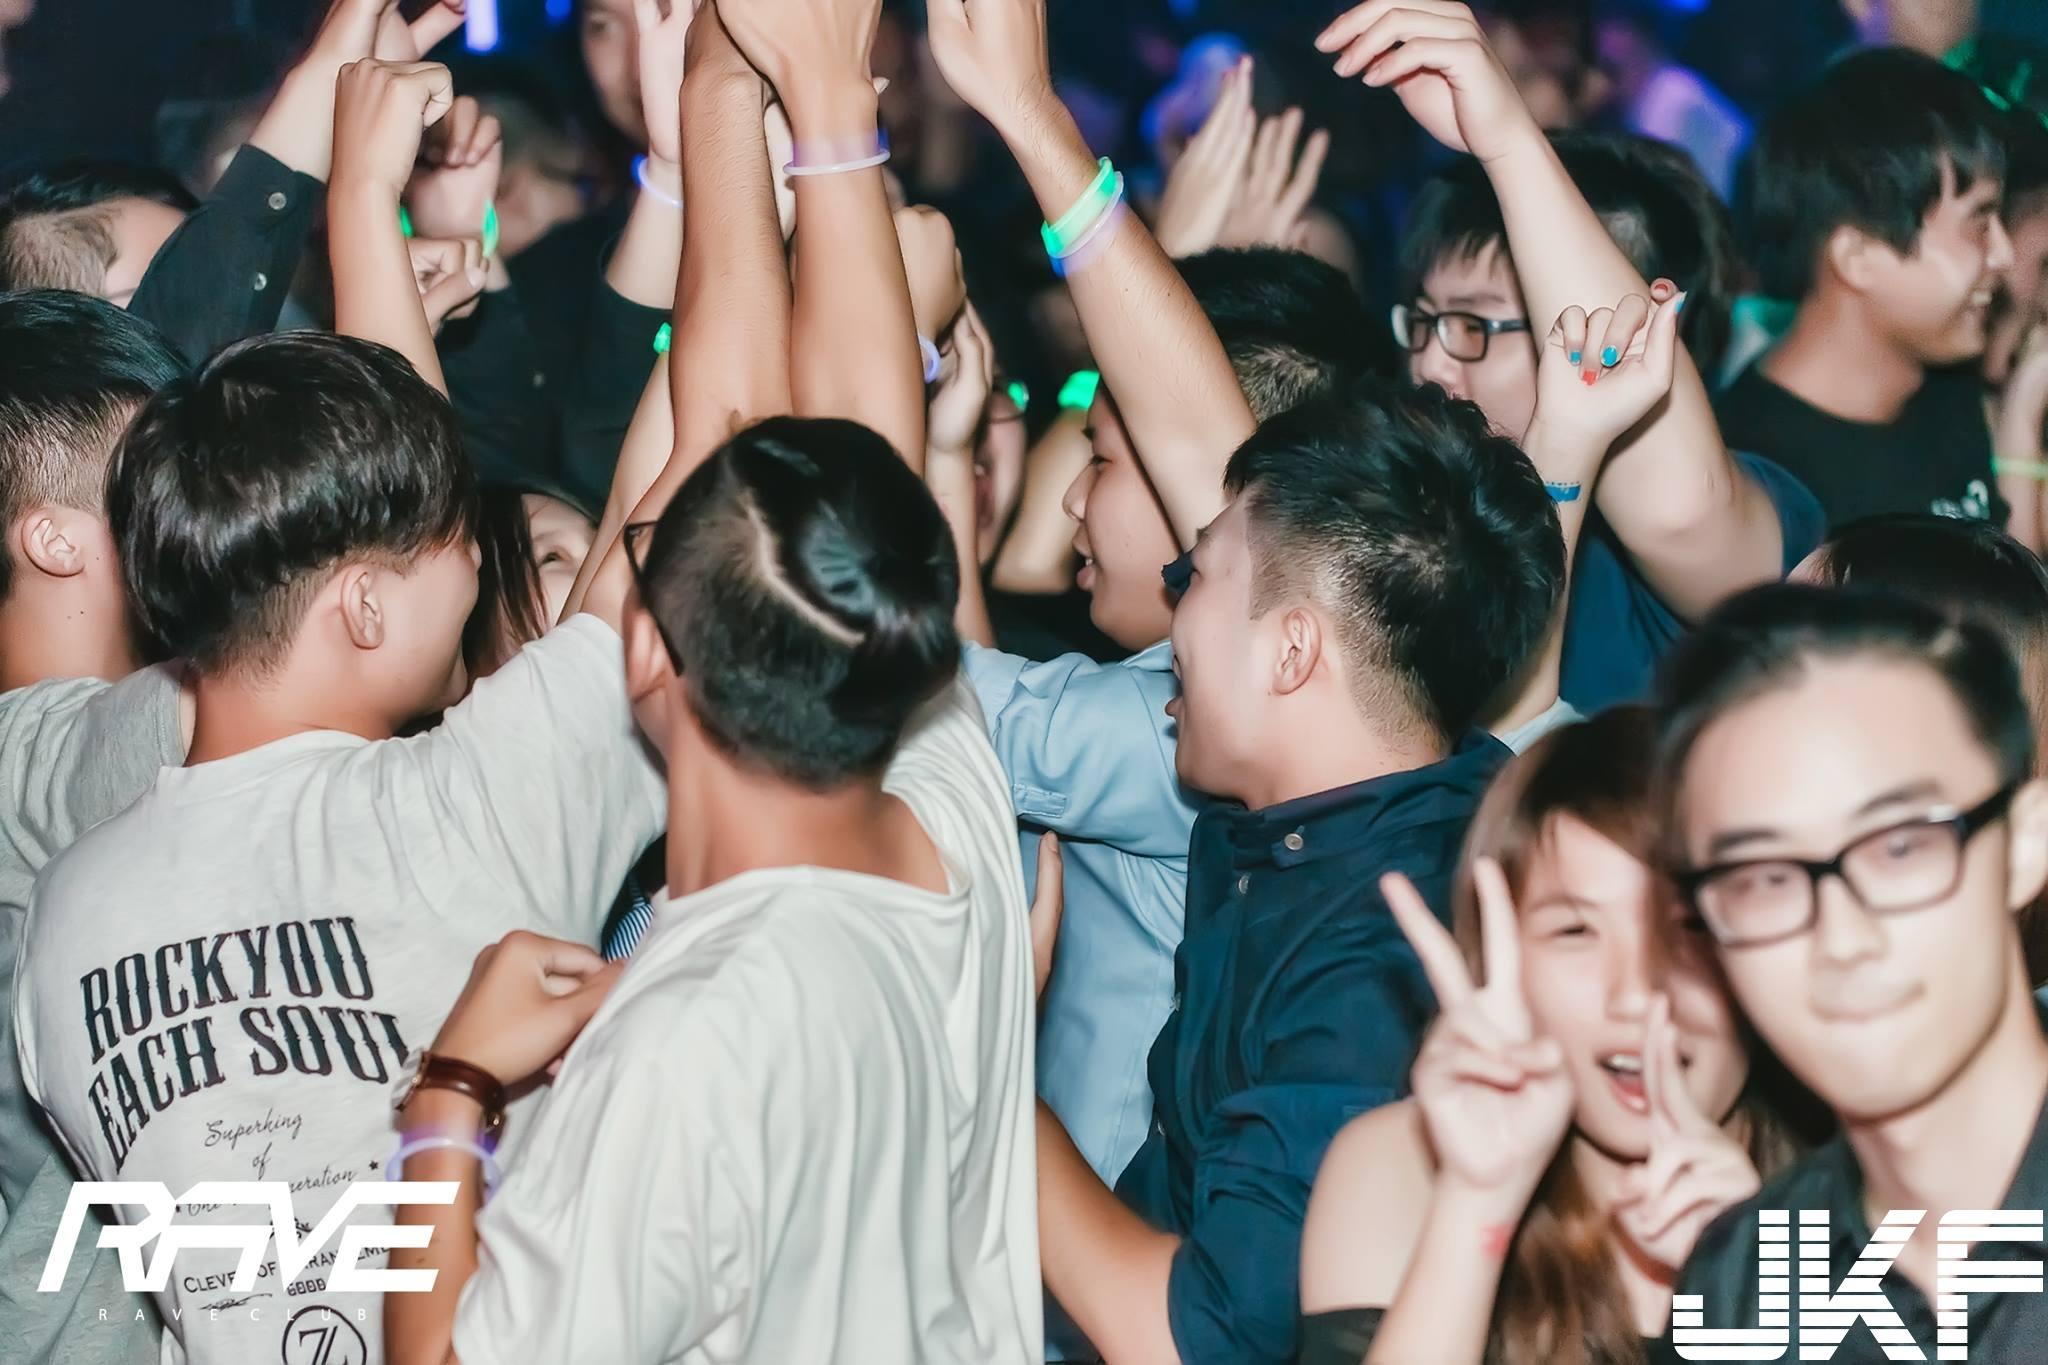 Rave club-2016.8.26(五)【蜜糖誘惑 一日情人DJ-Candice螢亂之夜】 - 夜店辣妹 -